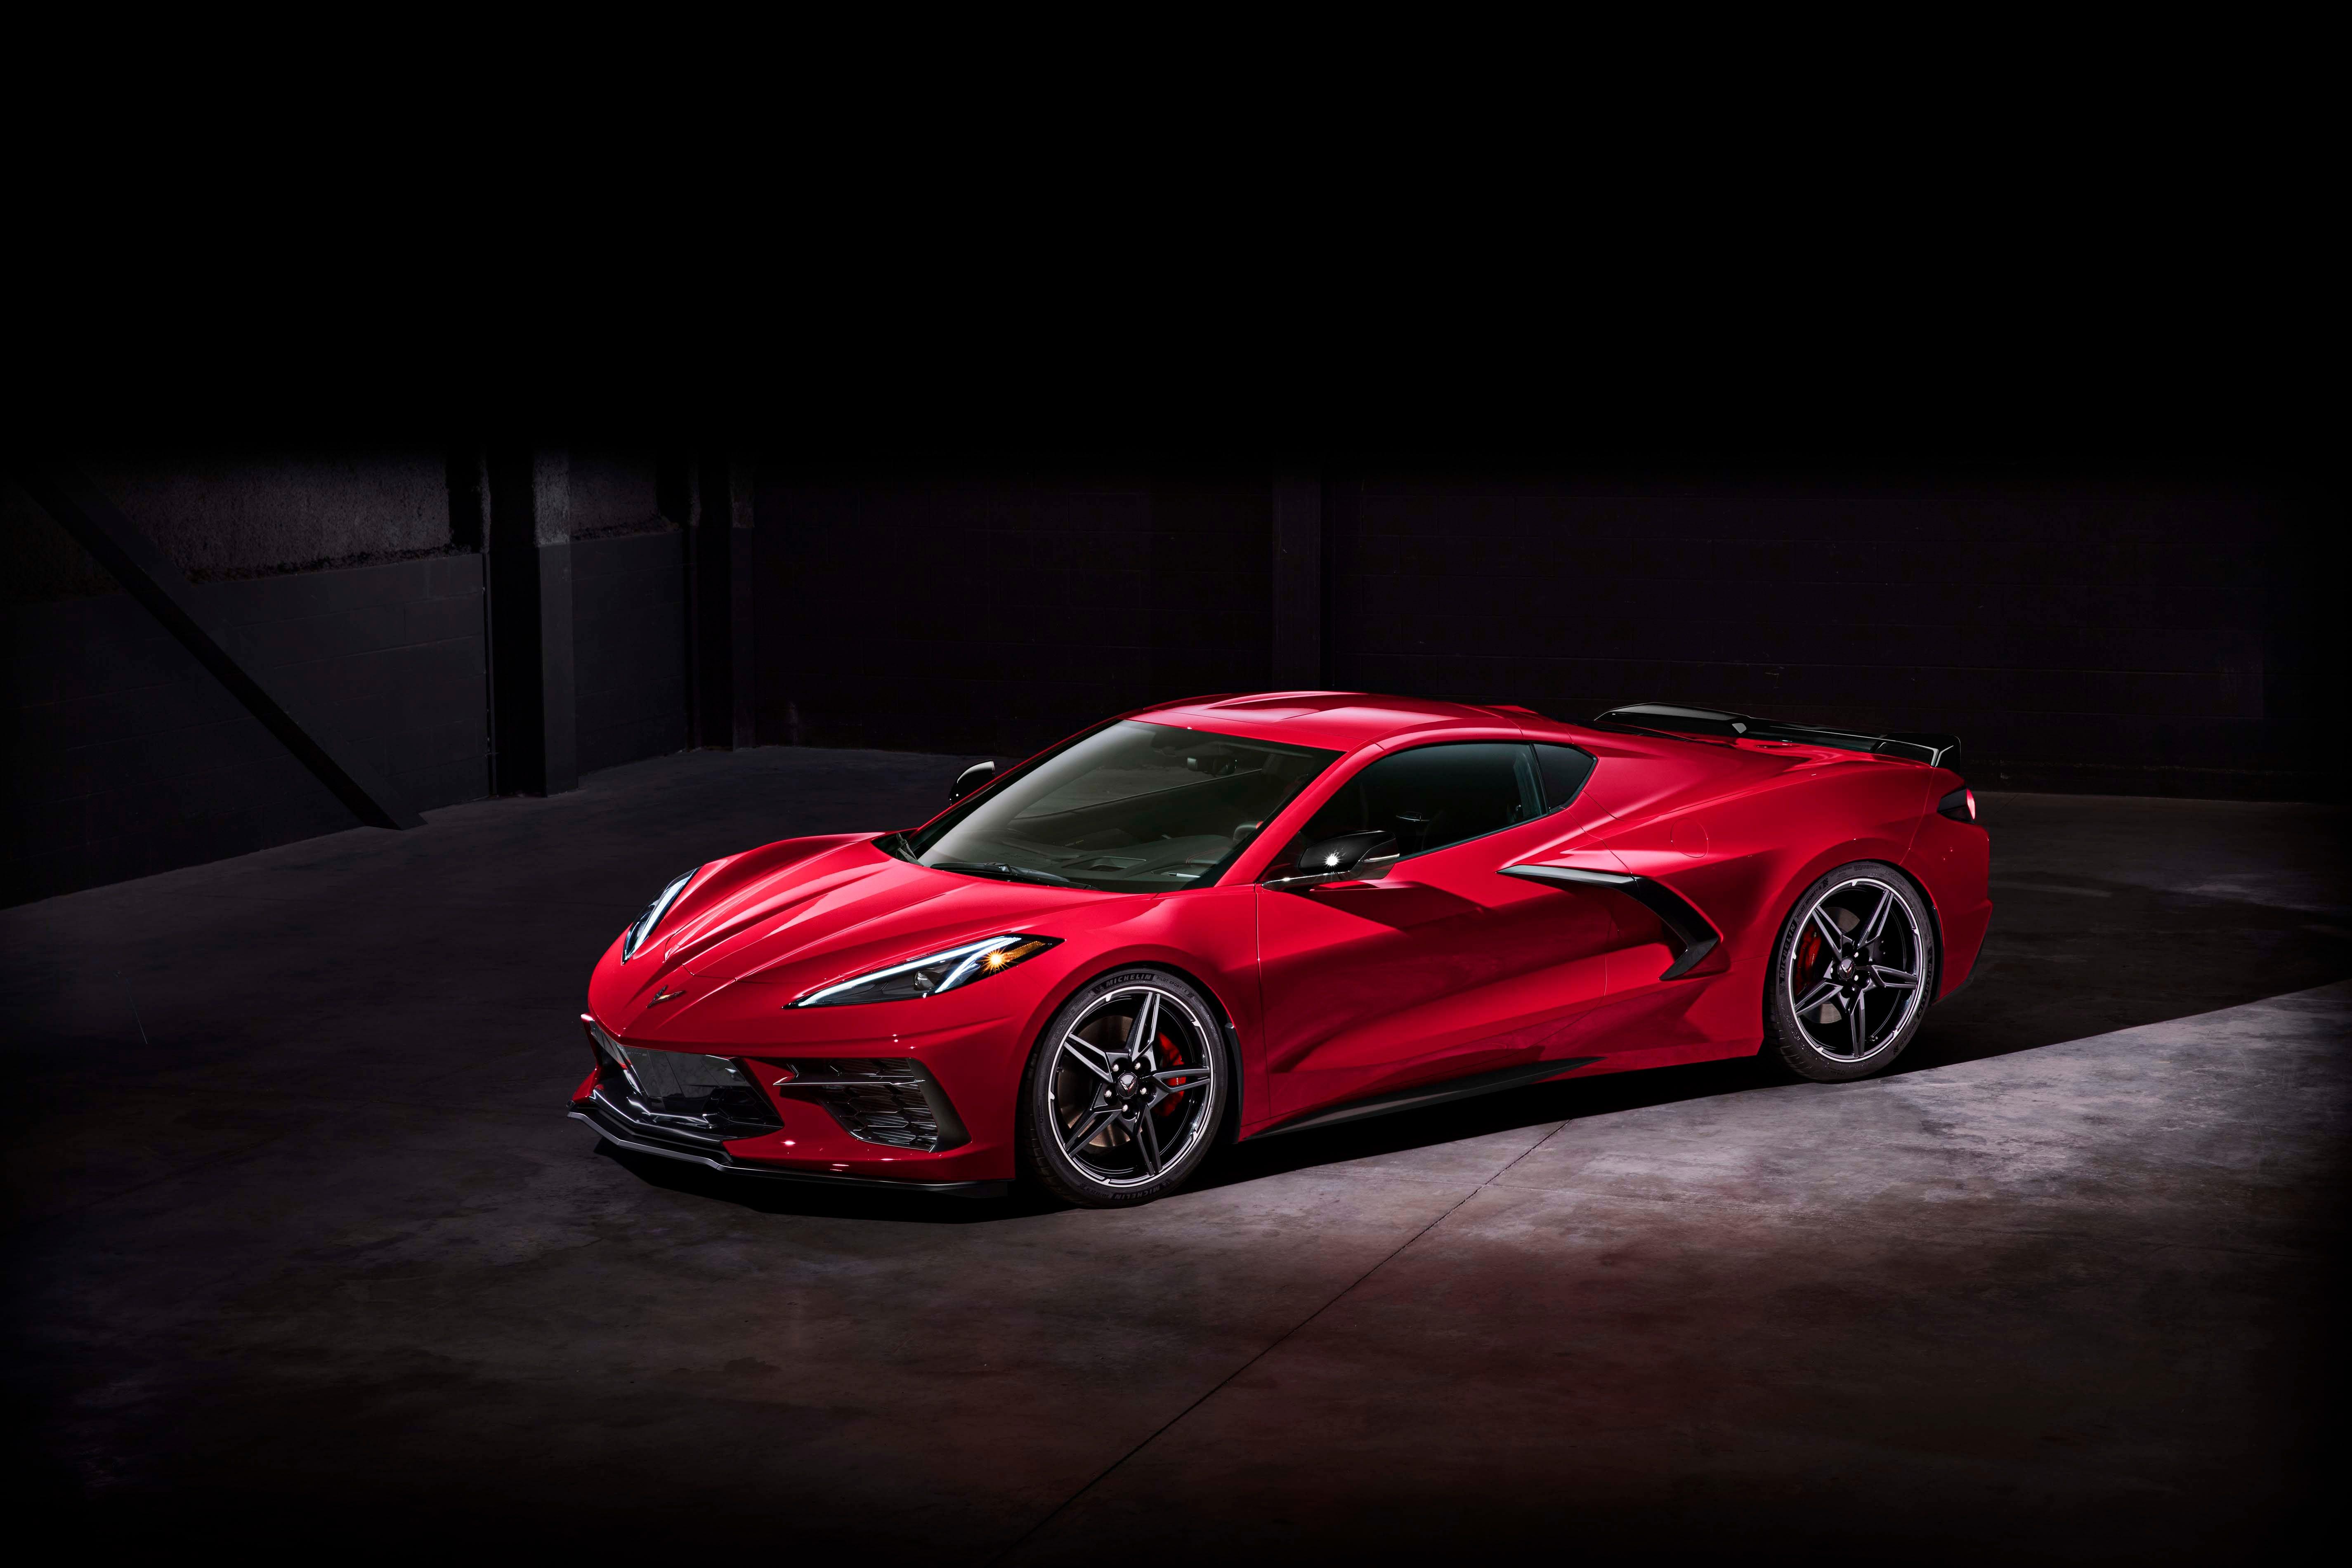 Corvette ALUMINUM LICENSE PLATE chevy chevrolet garage muscle car novelty sign